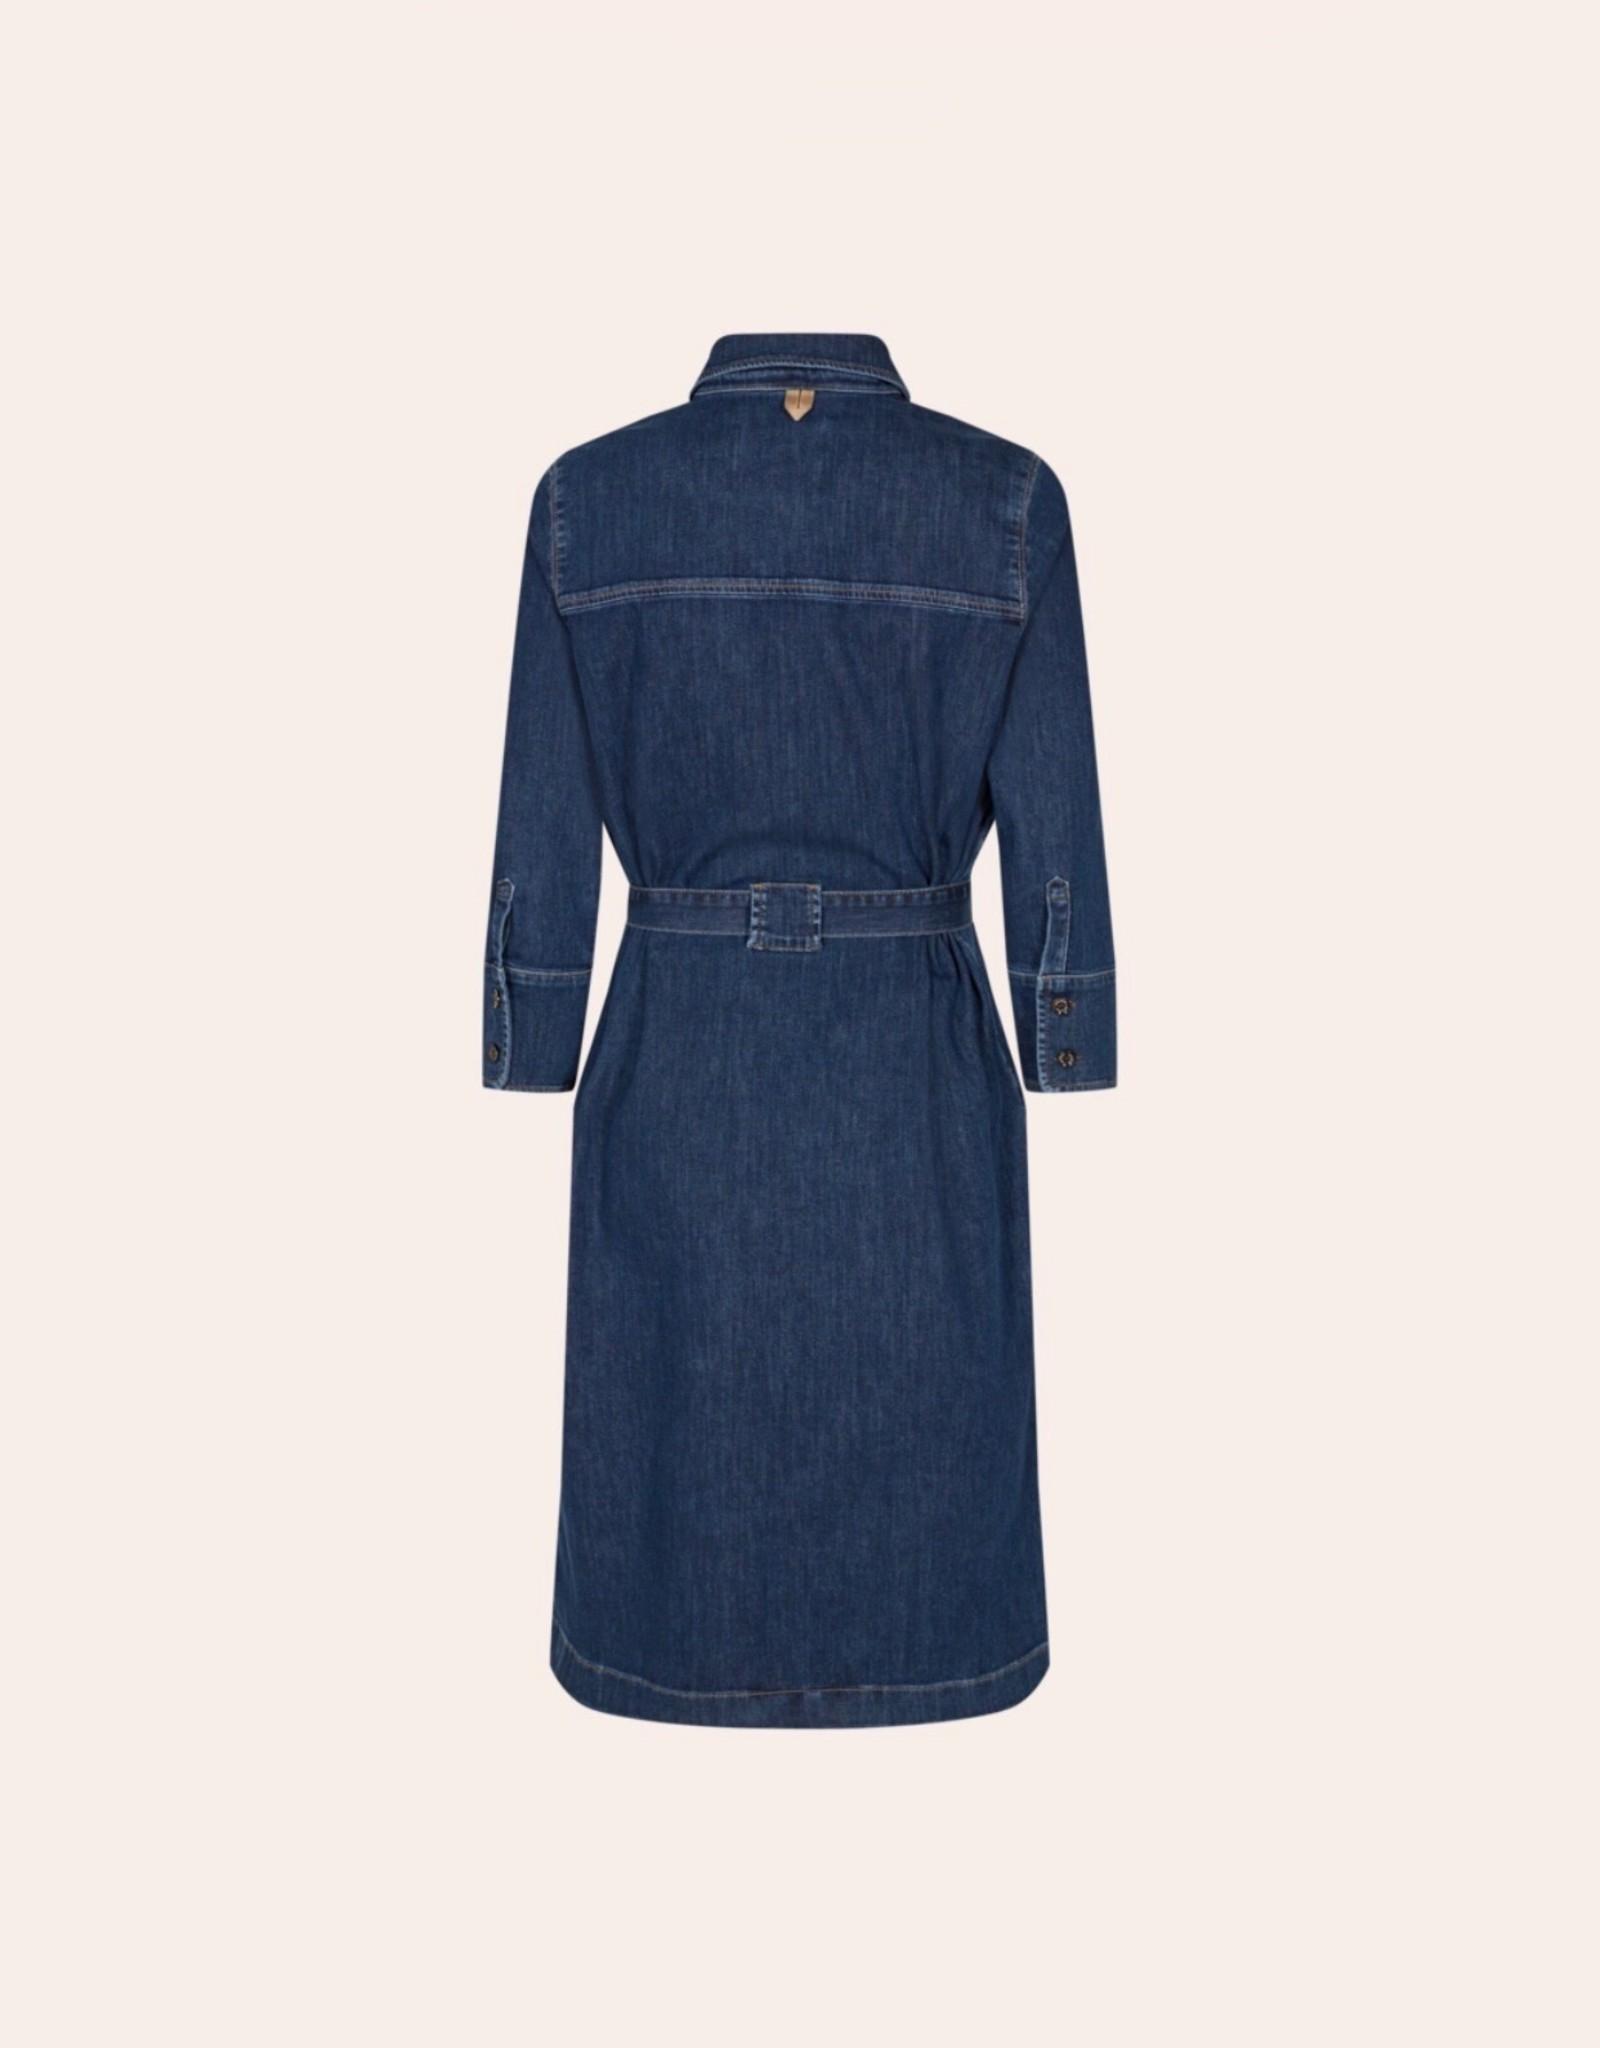 Mos Mosh Selby Denim Dress